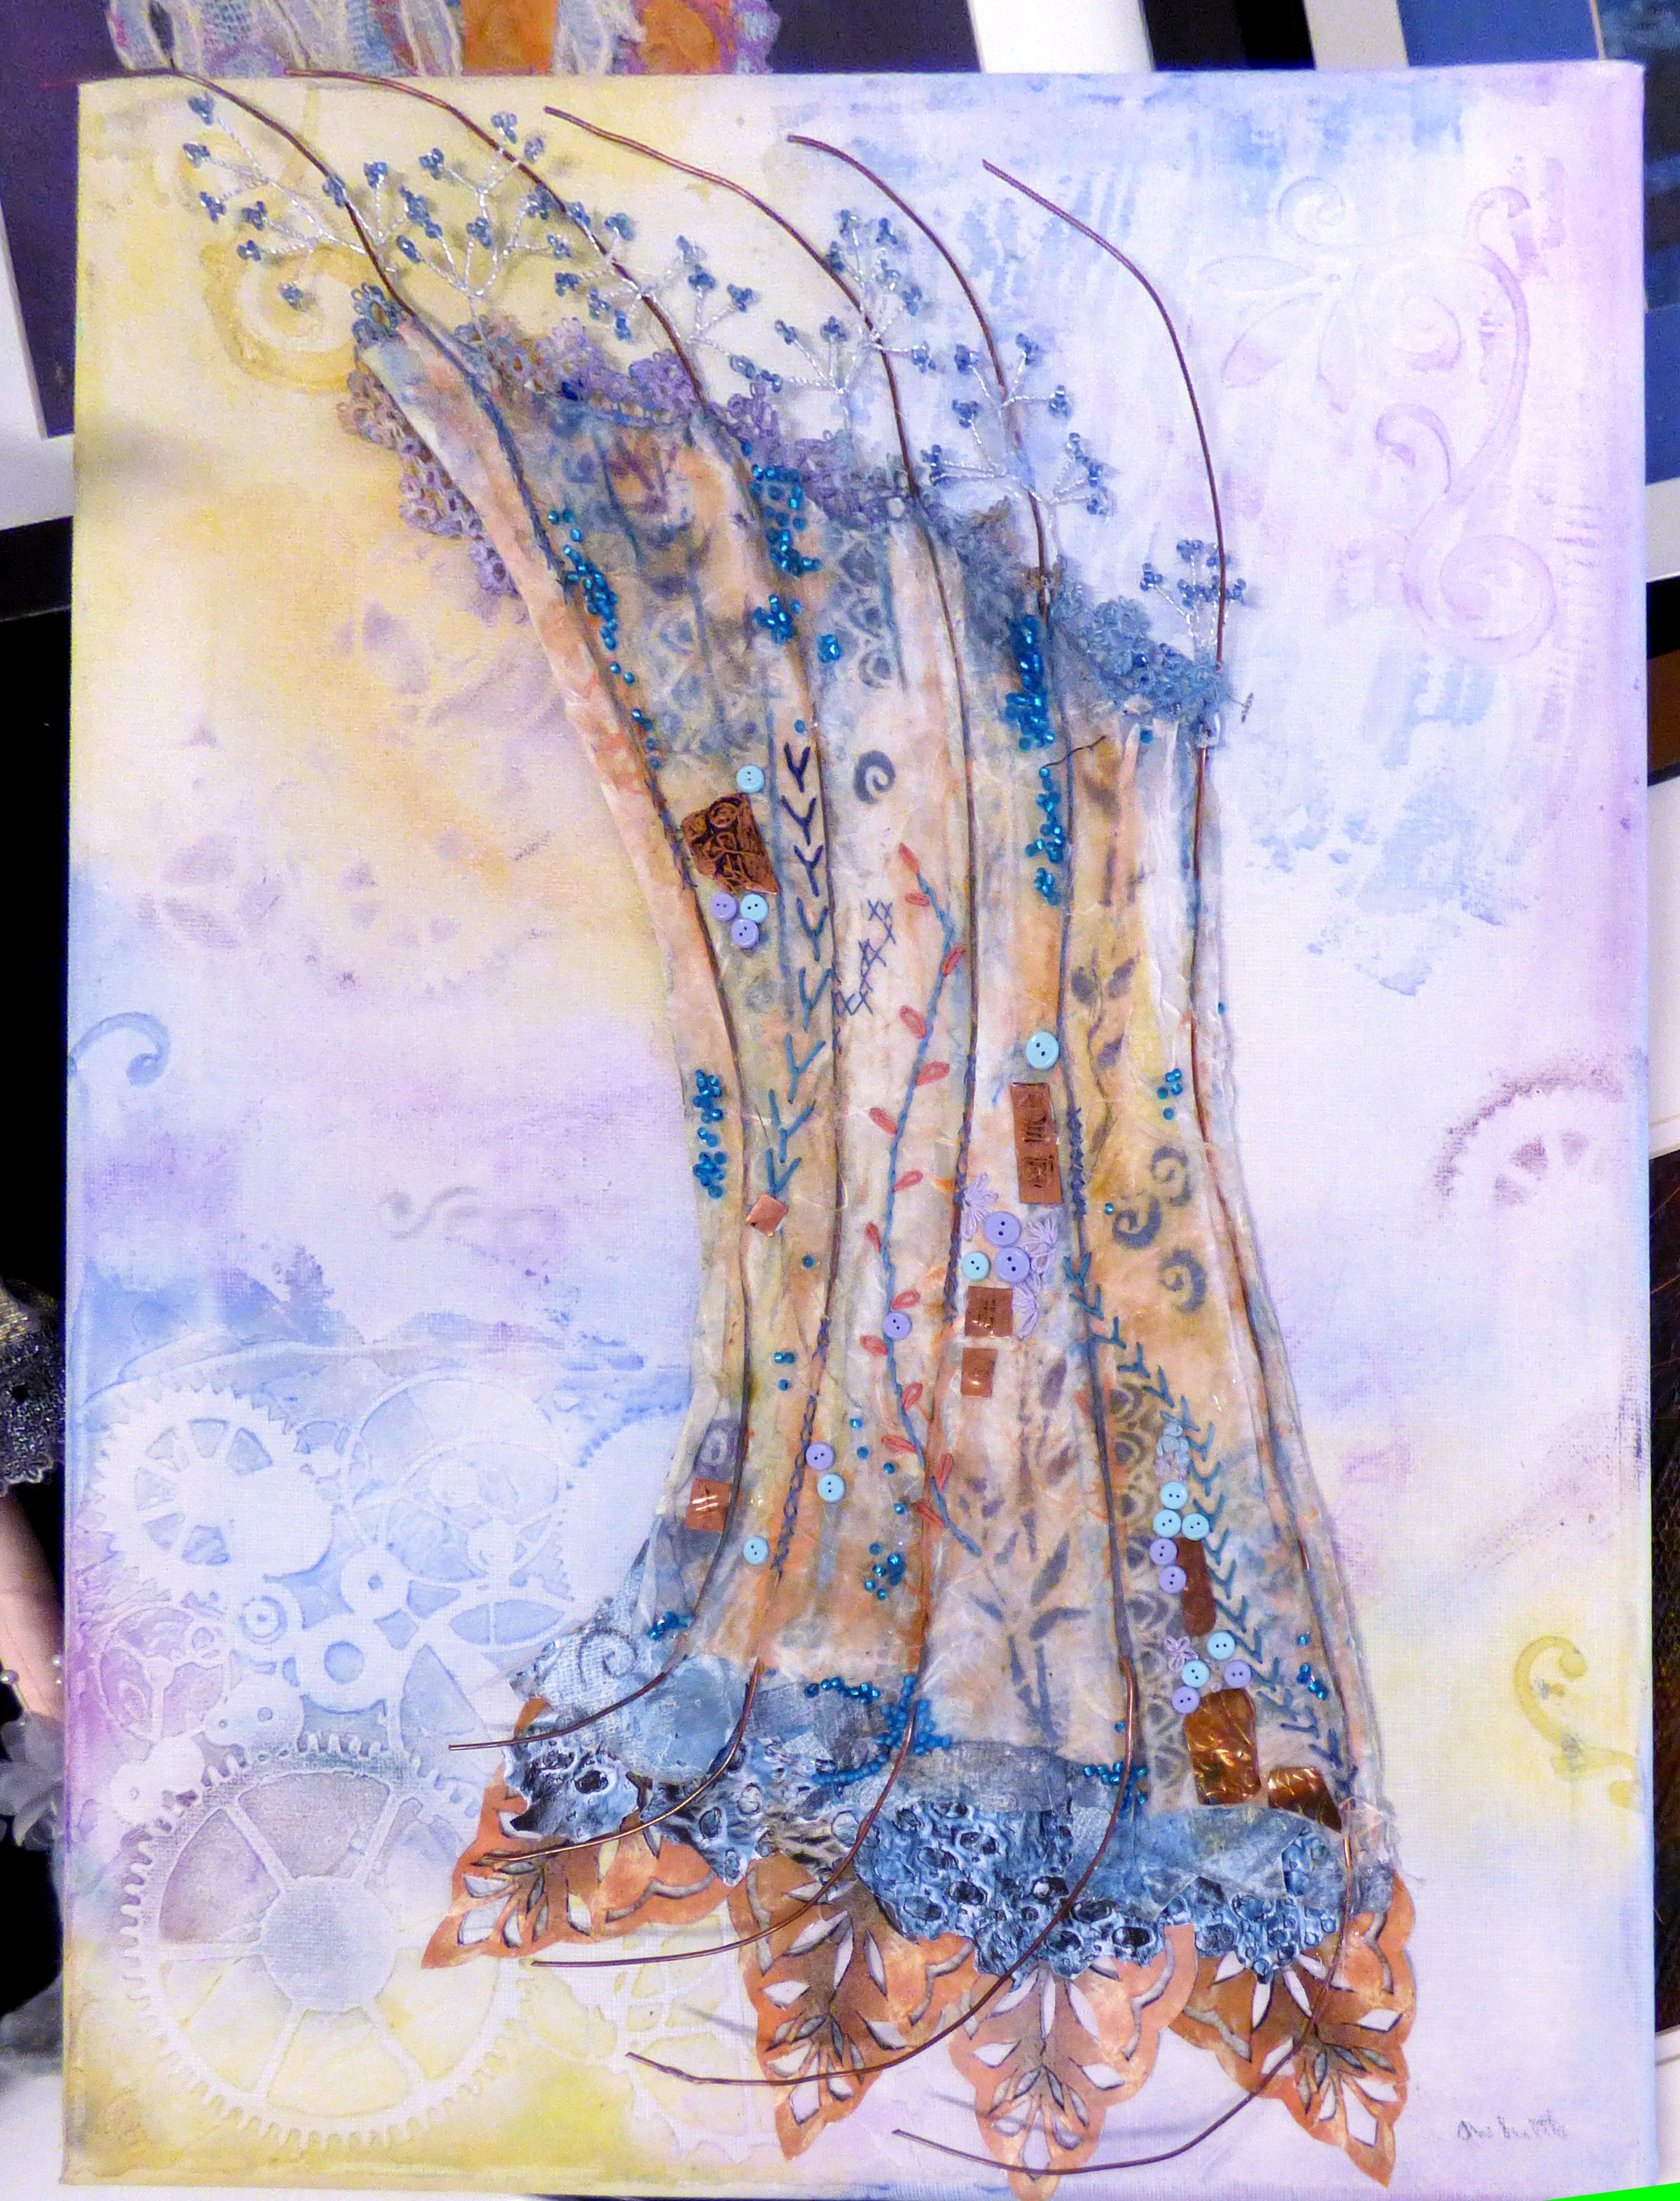 embroidery by Jenny Whittle, Bolton EG 2018